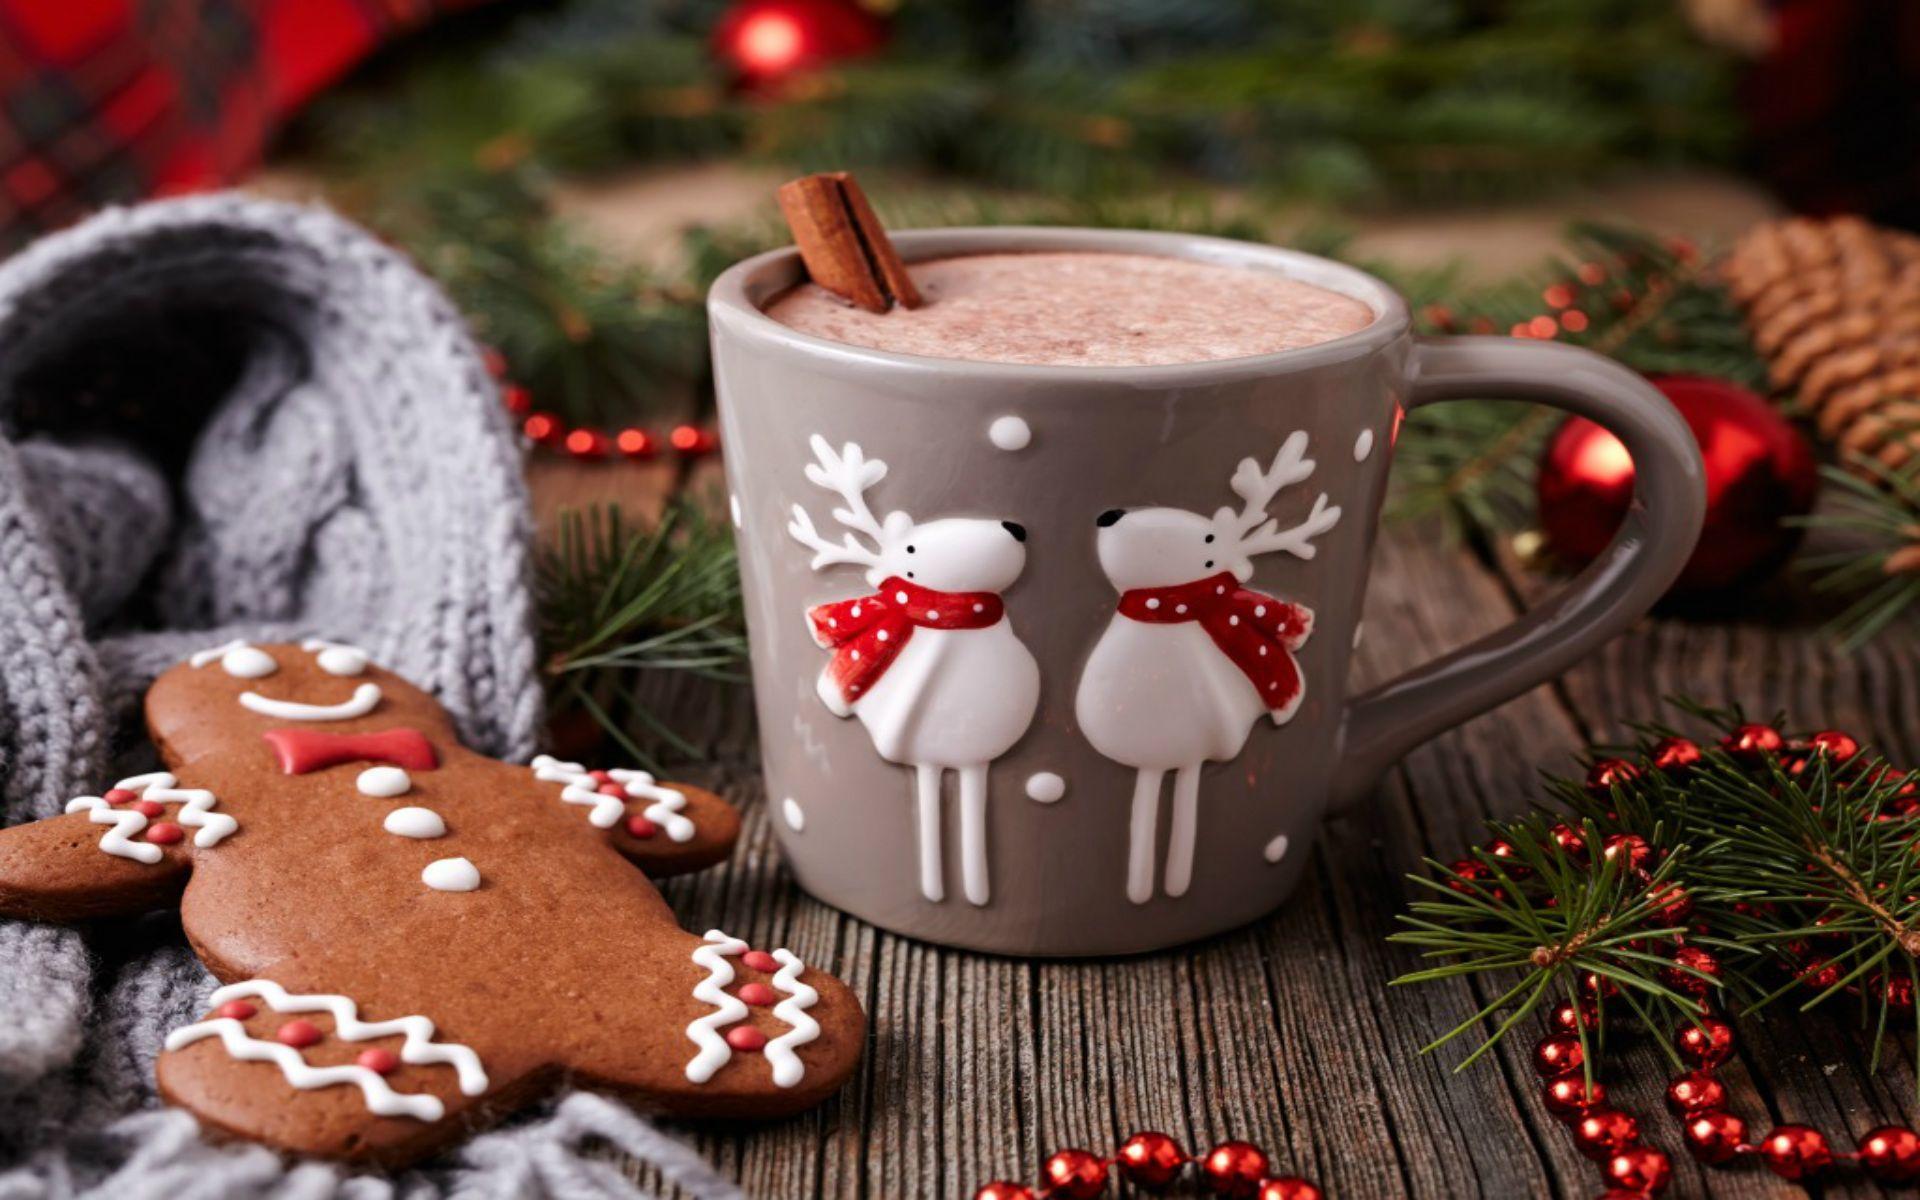 Rustic Christmas Wallpapers - Top Free Rustic Christmas ...